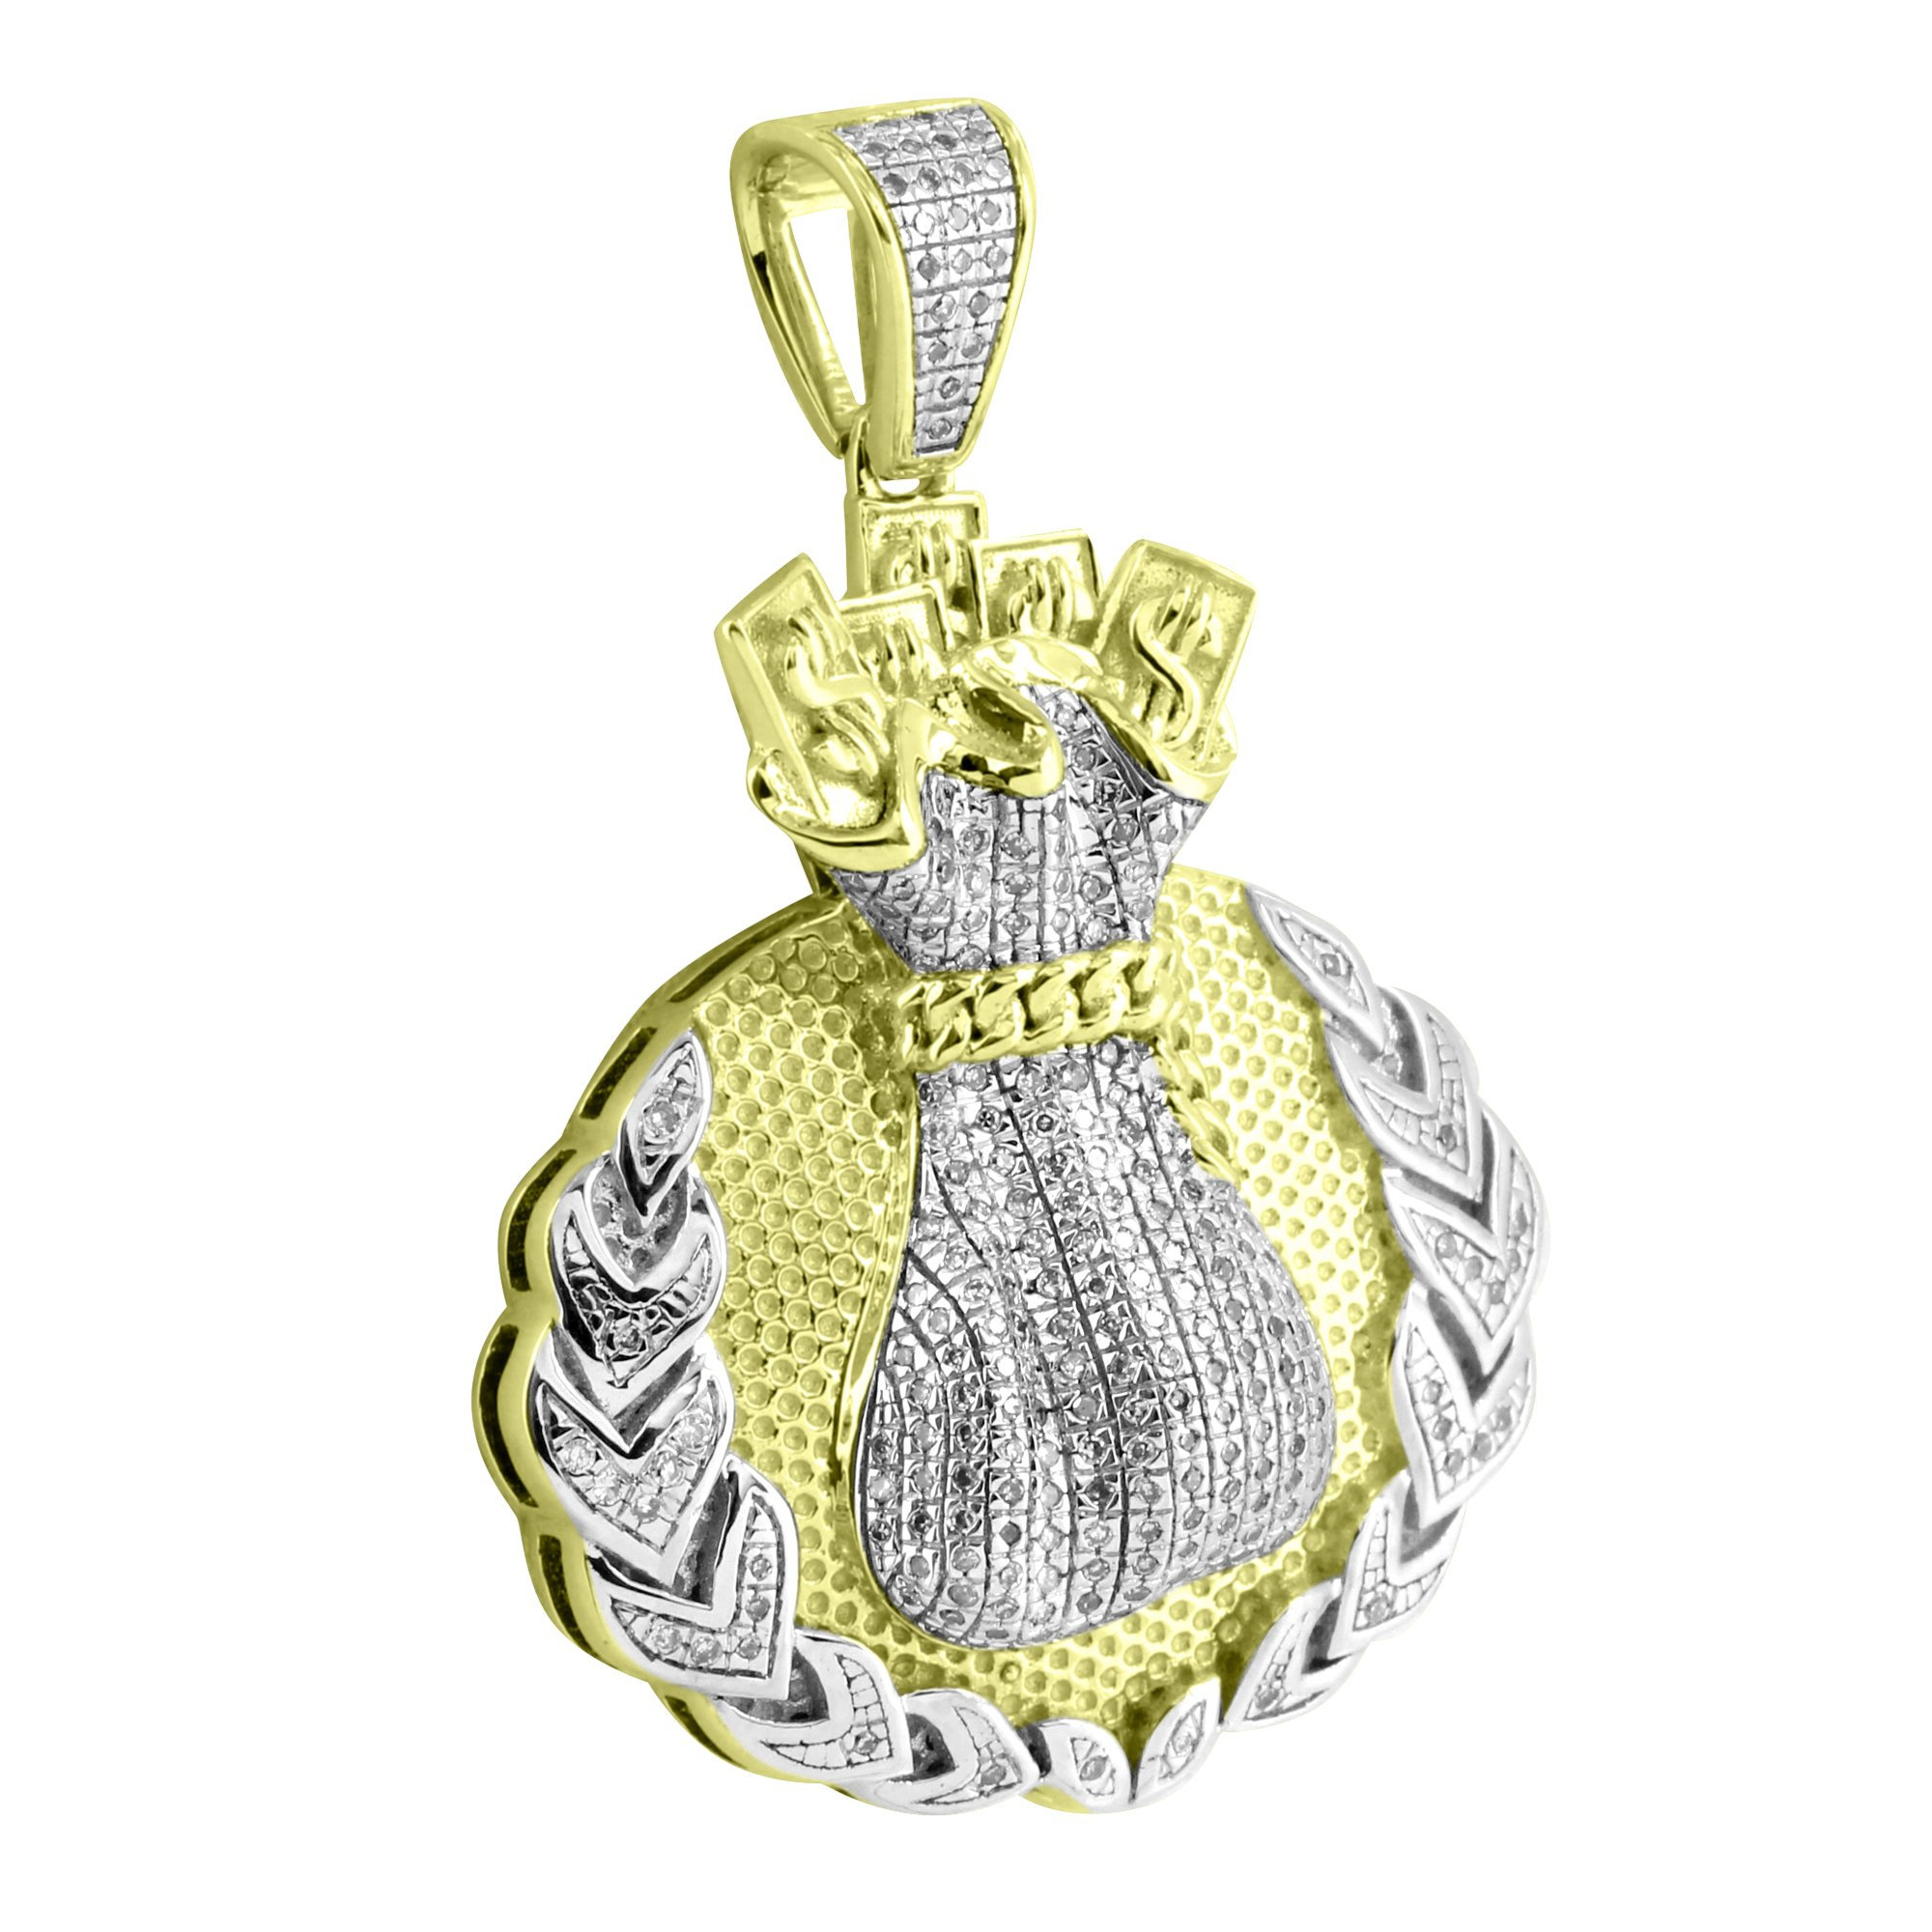 Money Bag Miami Cuban Design 10k Yellow Gold 0.40 Ct Diamond Pendant Unique Mens